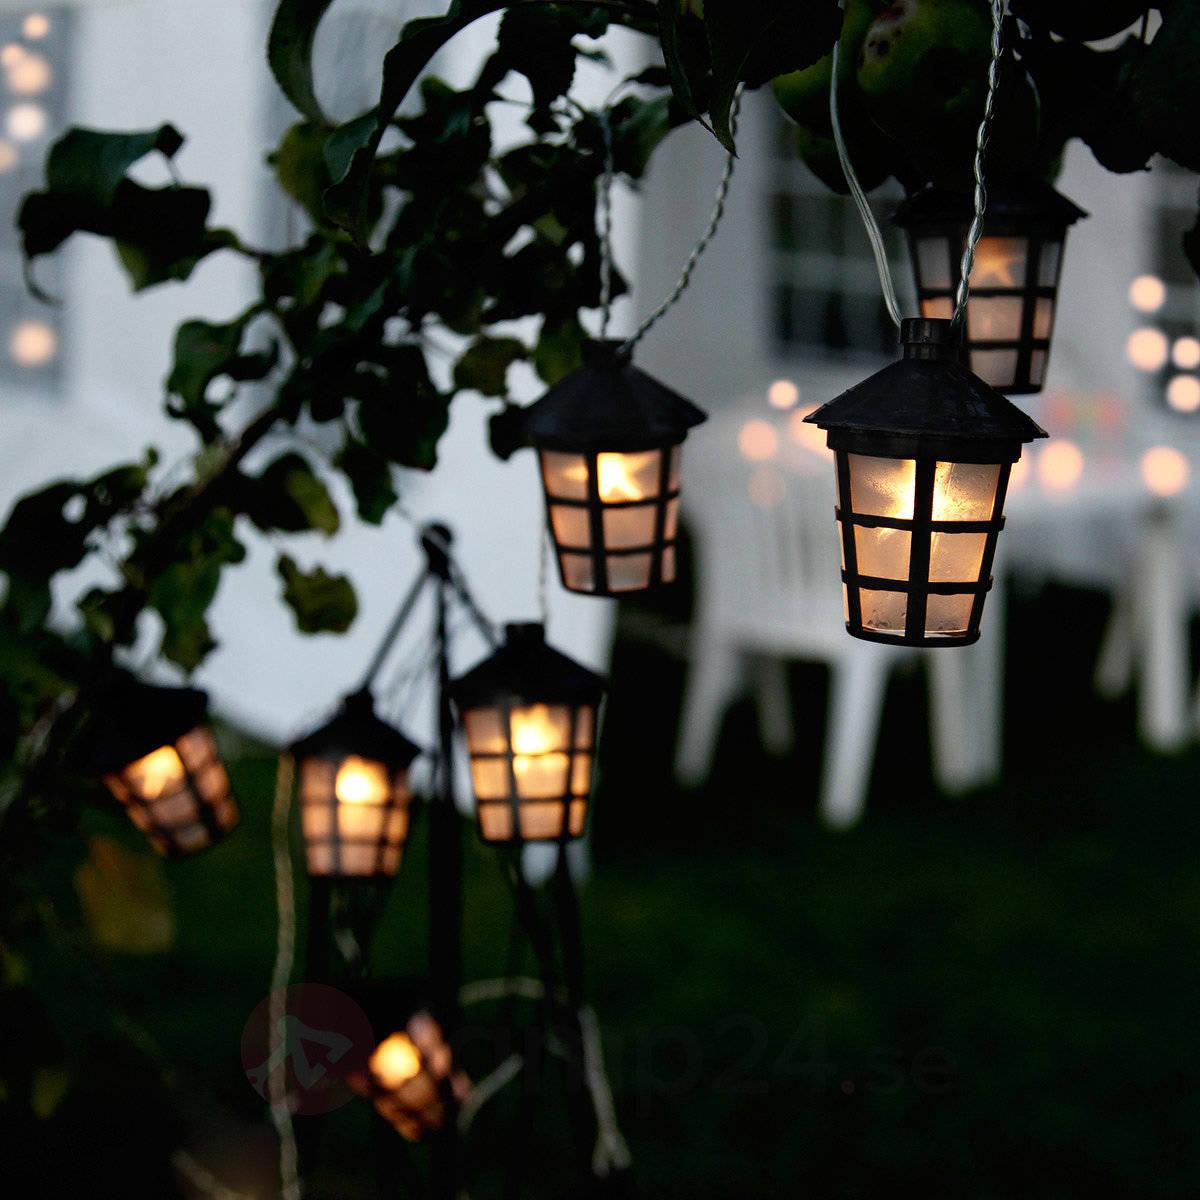 led-ljusslinga-utomhus-party-lantern-med-10-ljus-8d28-324678